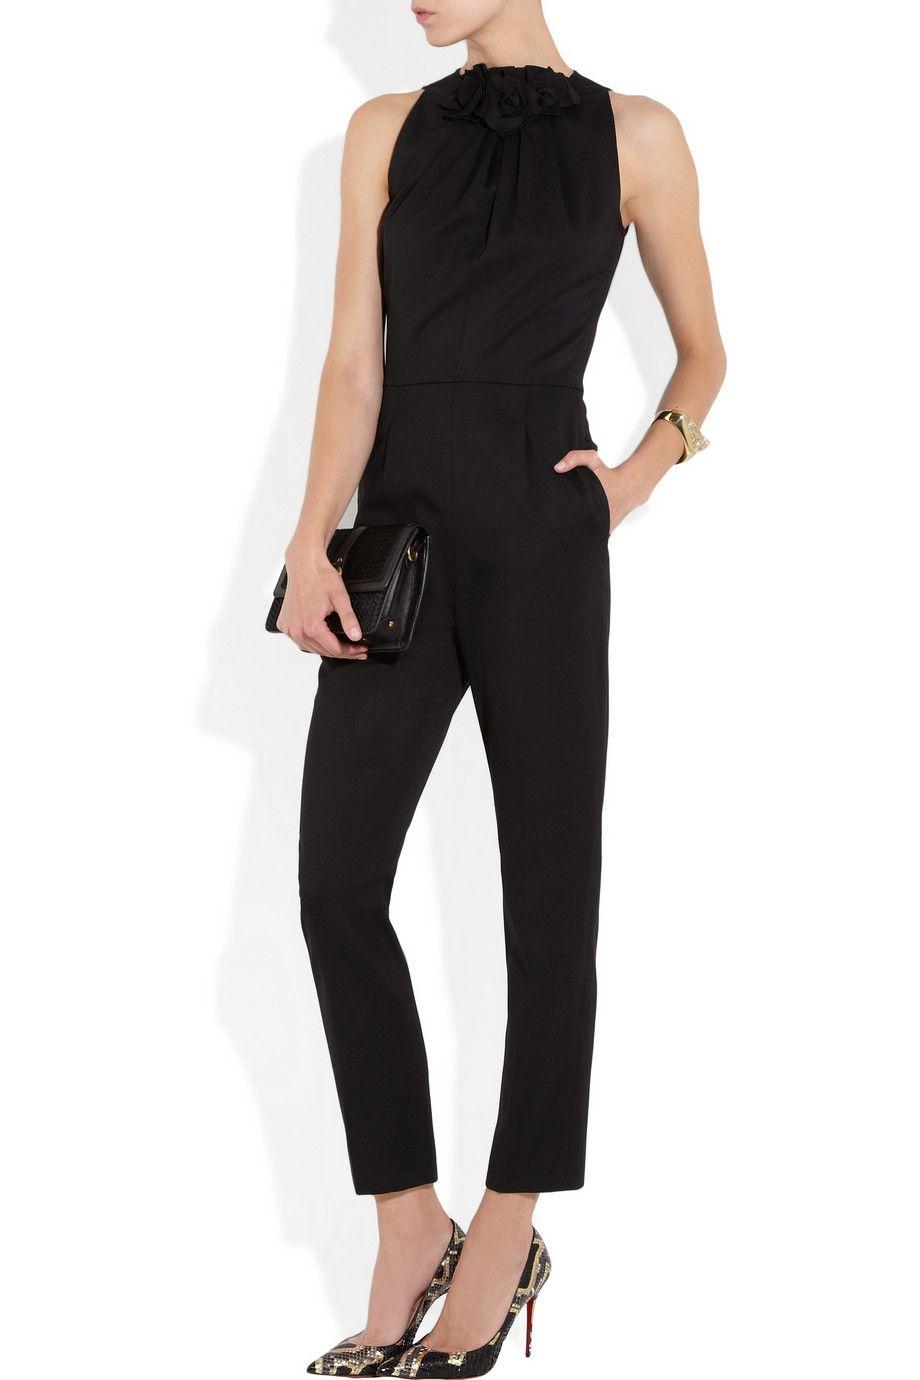 Valentino jumpsuit, Chloé cuff, Maiyet bag, Christian Louboutin pumps